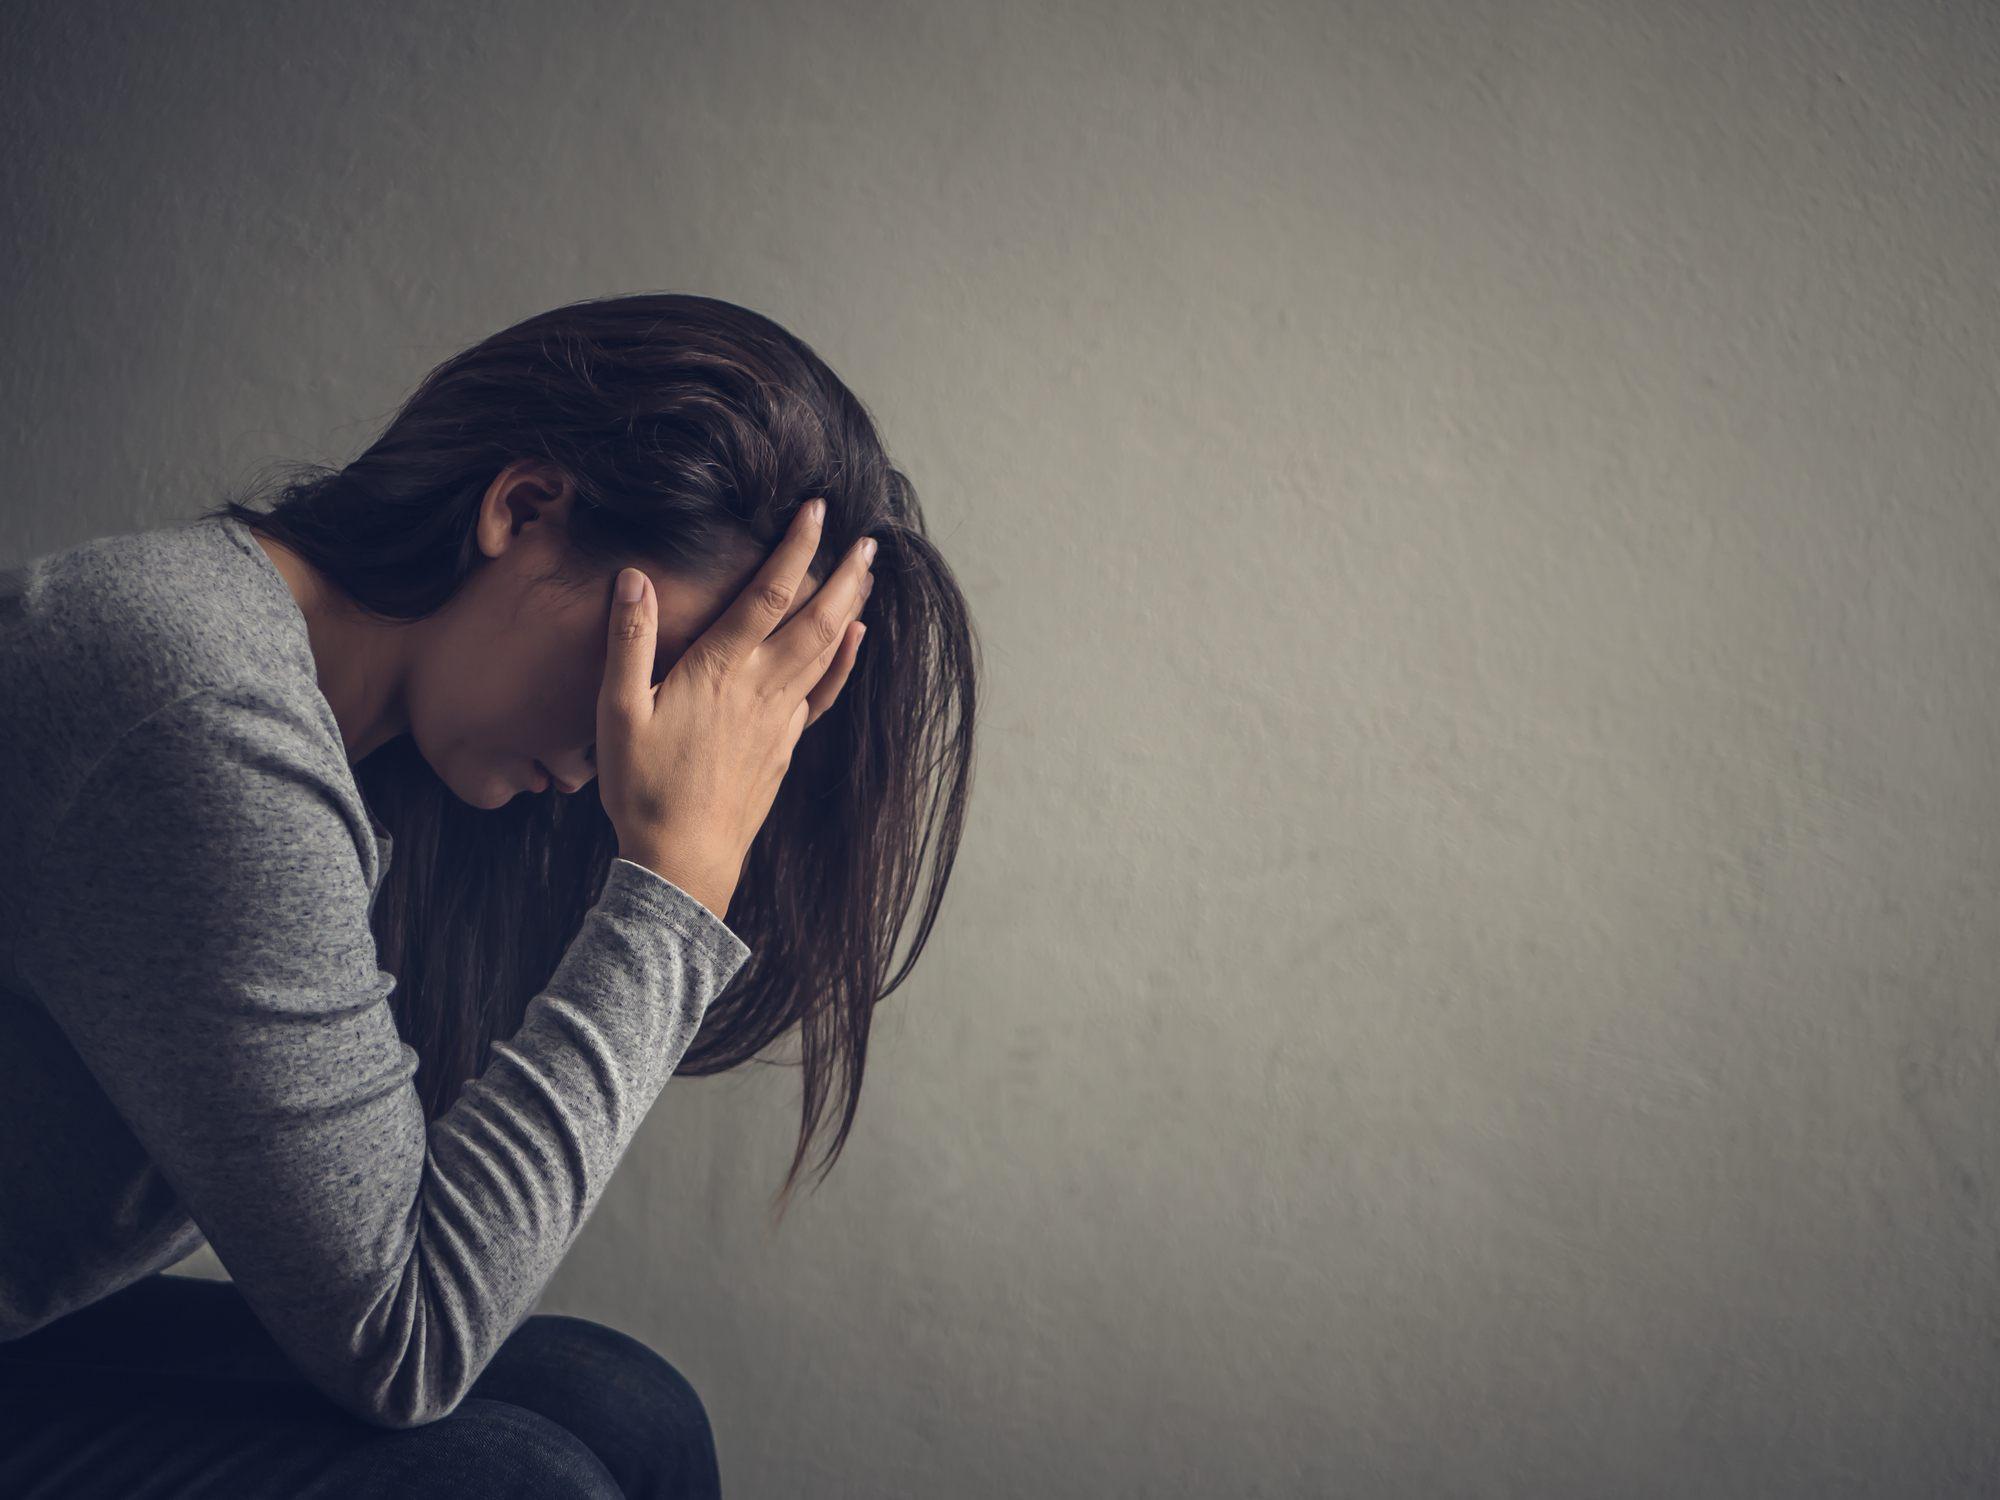 ashamed woman